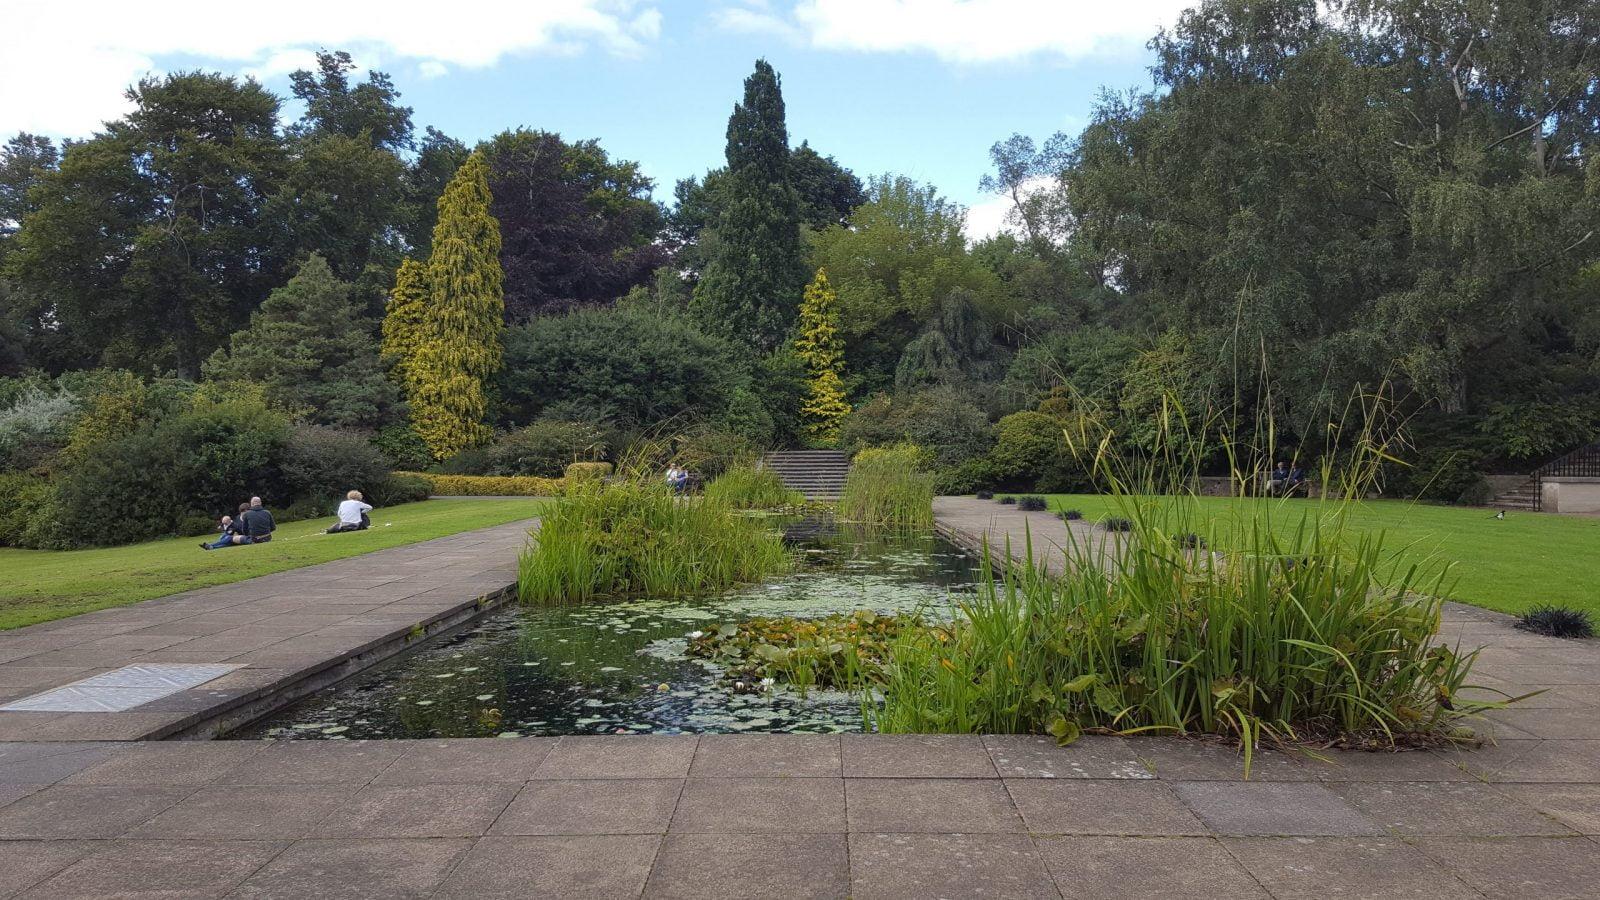 Visiting Hill Garden & Pergola, Hampstead Heath: Photo Gallery 17